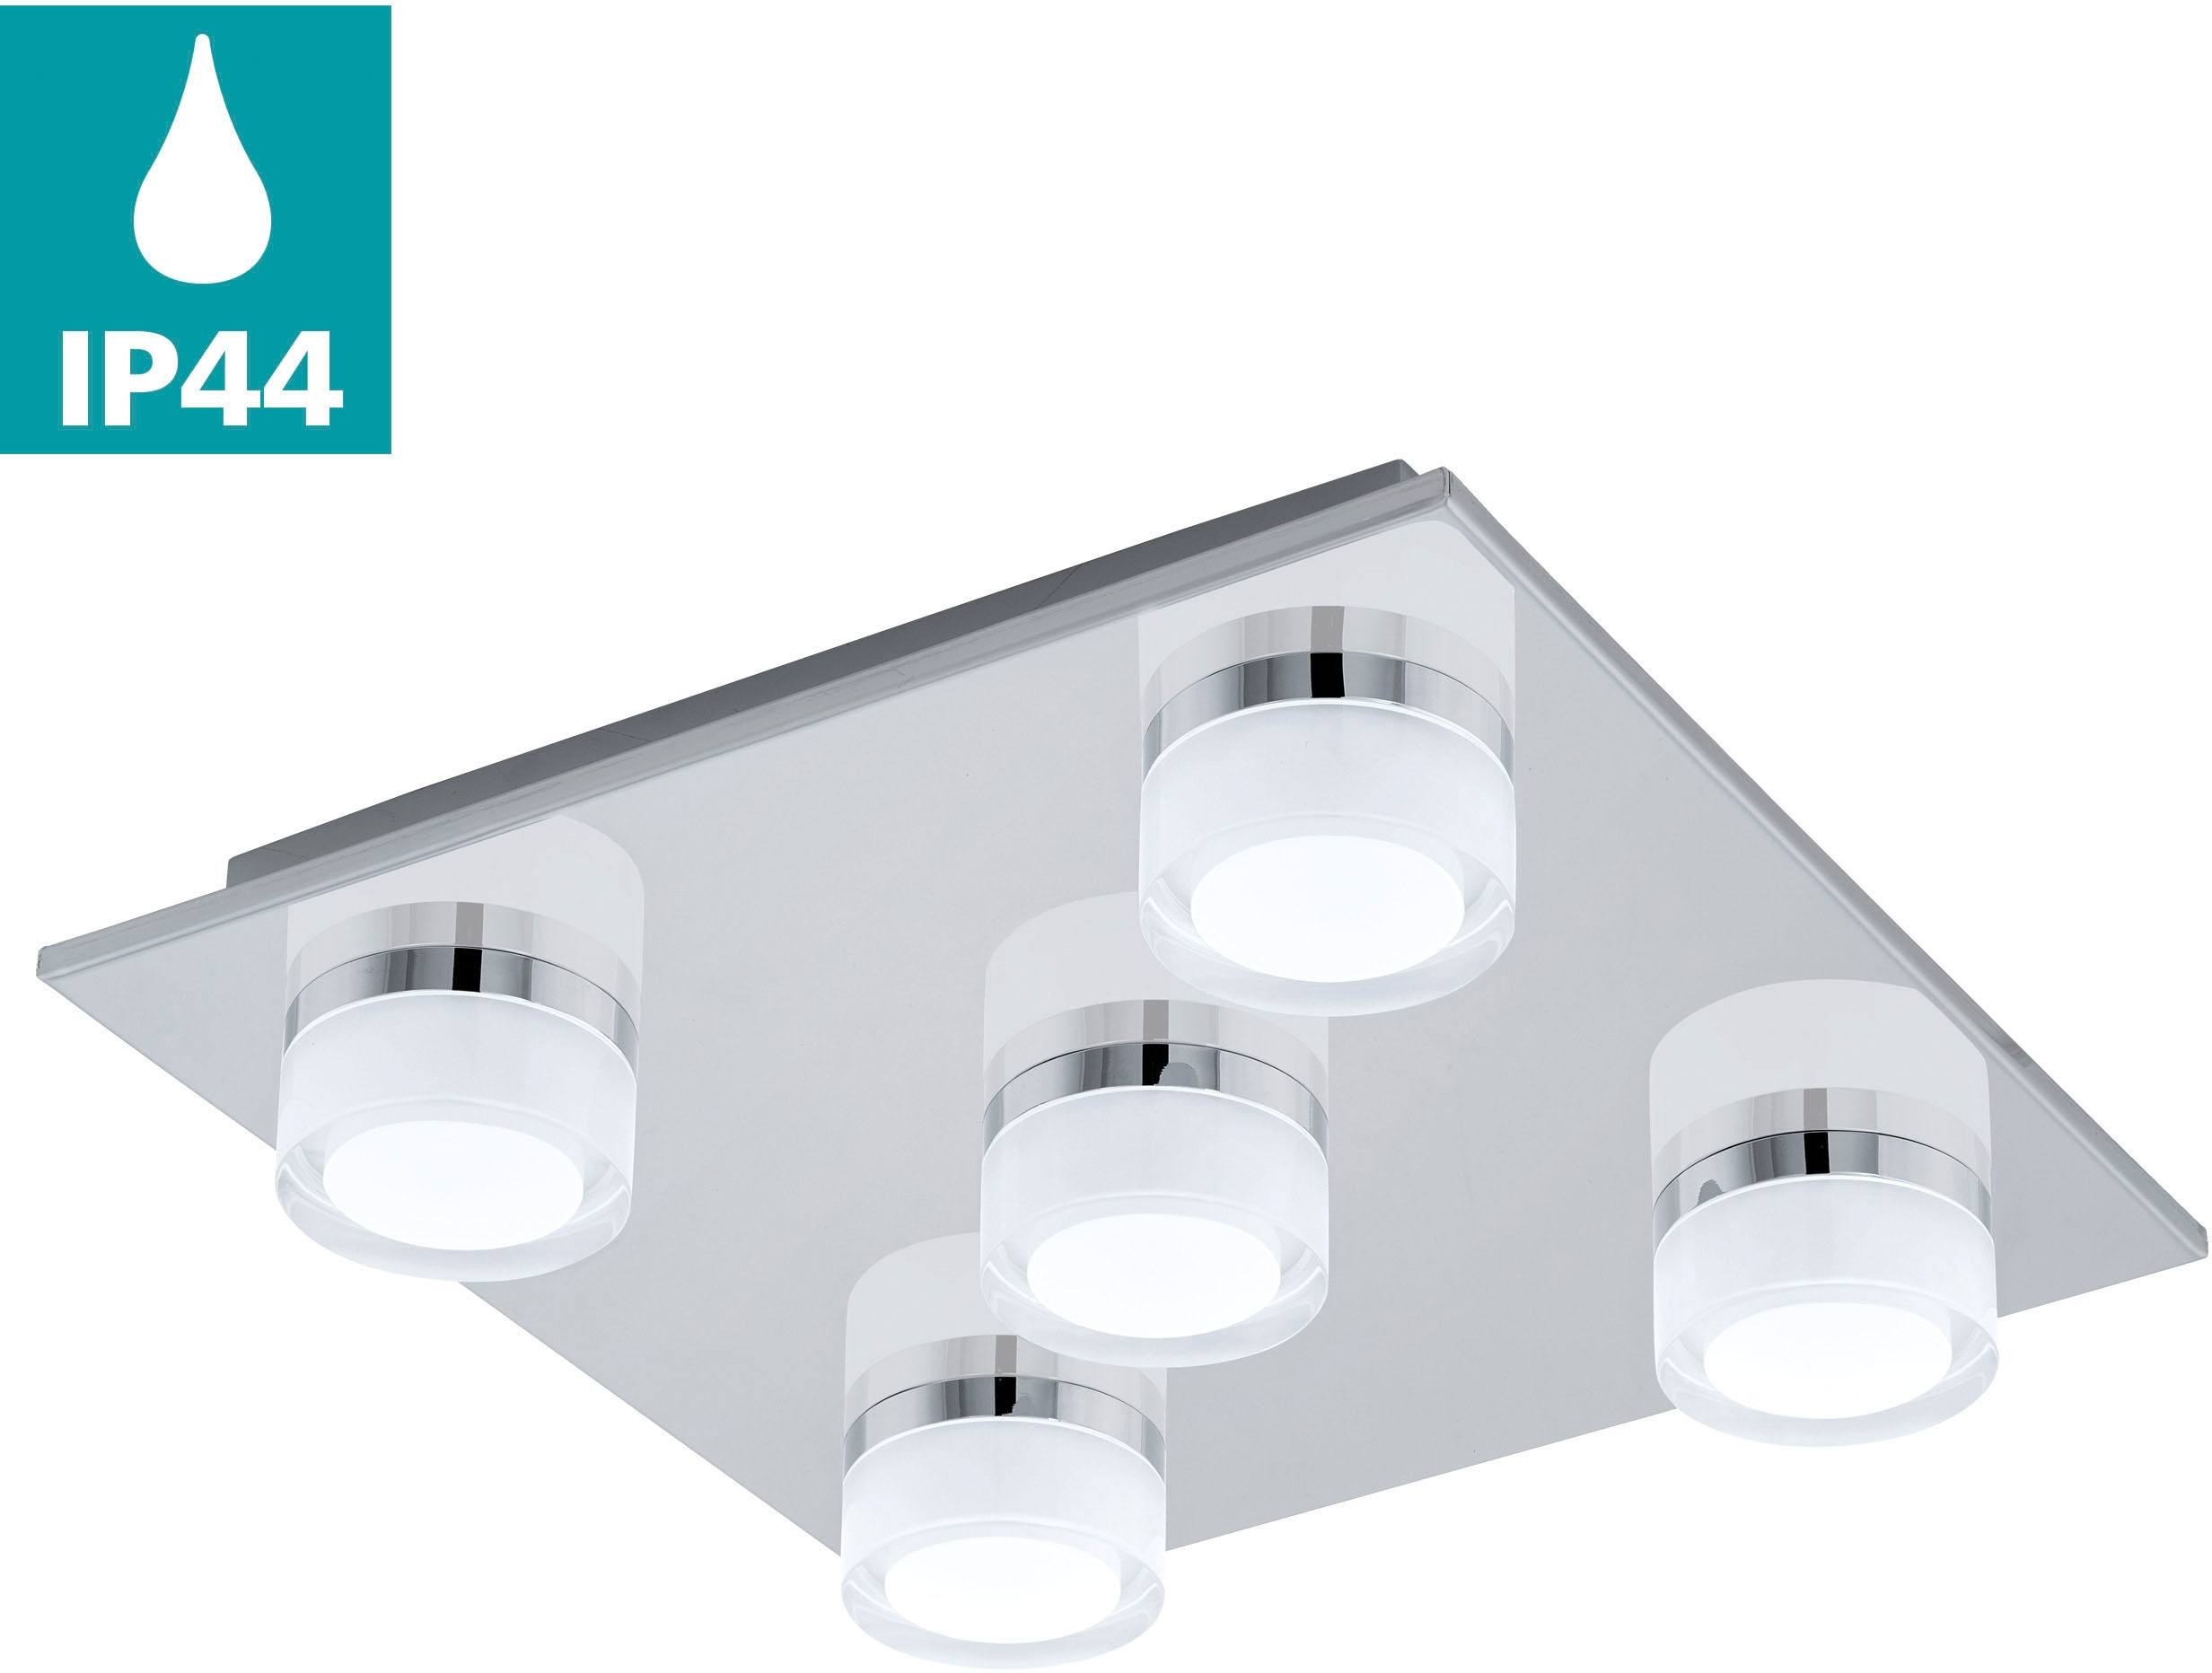 EGLO LED Deckenleuchte ROMENDO, LED-Board, Warmweiß, LED Deckenlampe